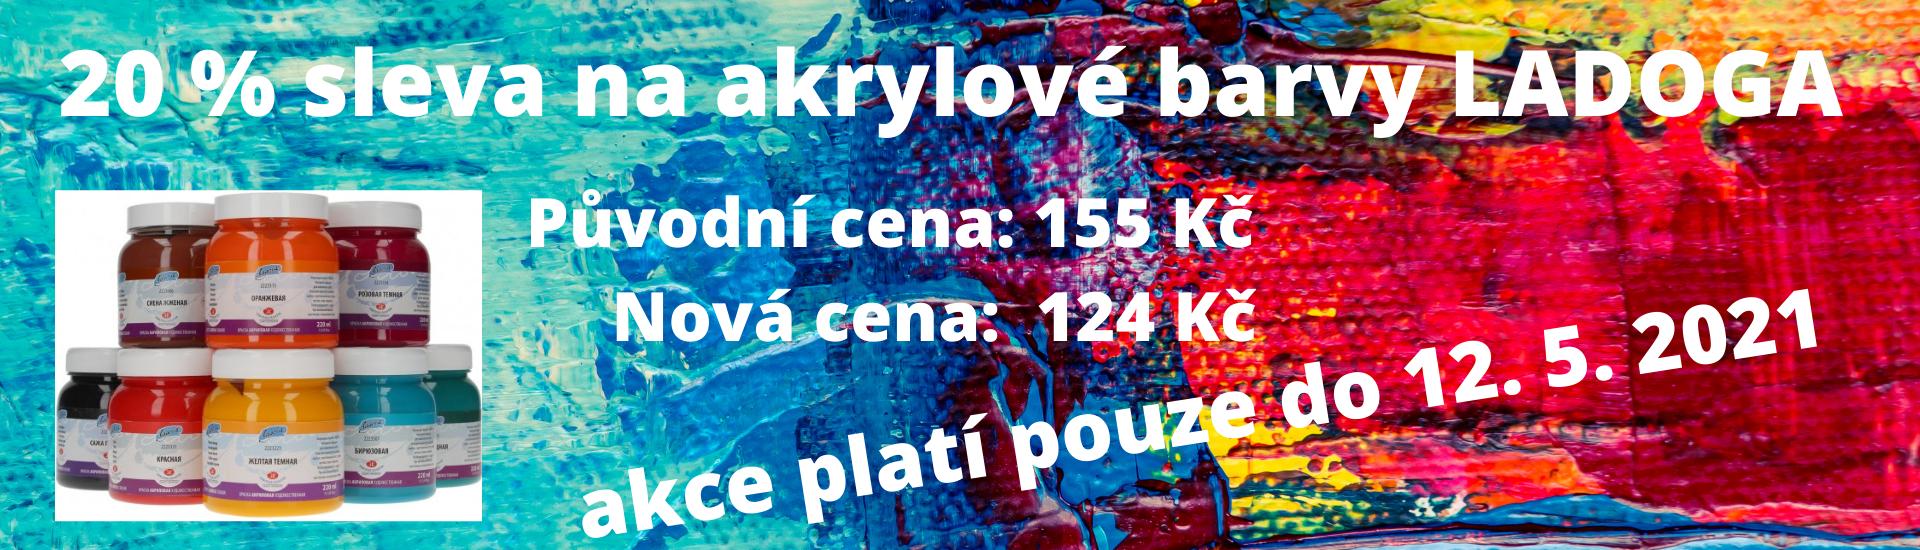 Akrylové barvy Ladoga